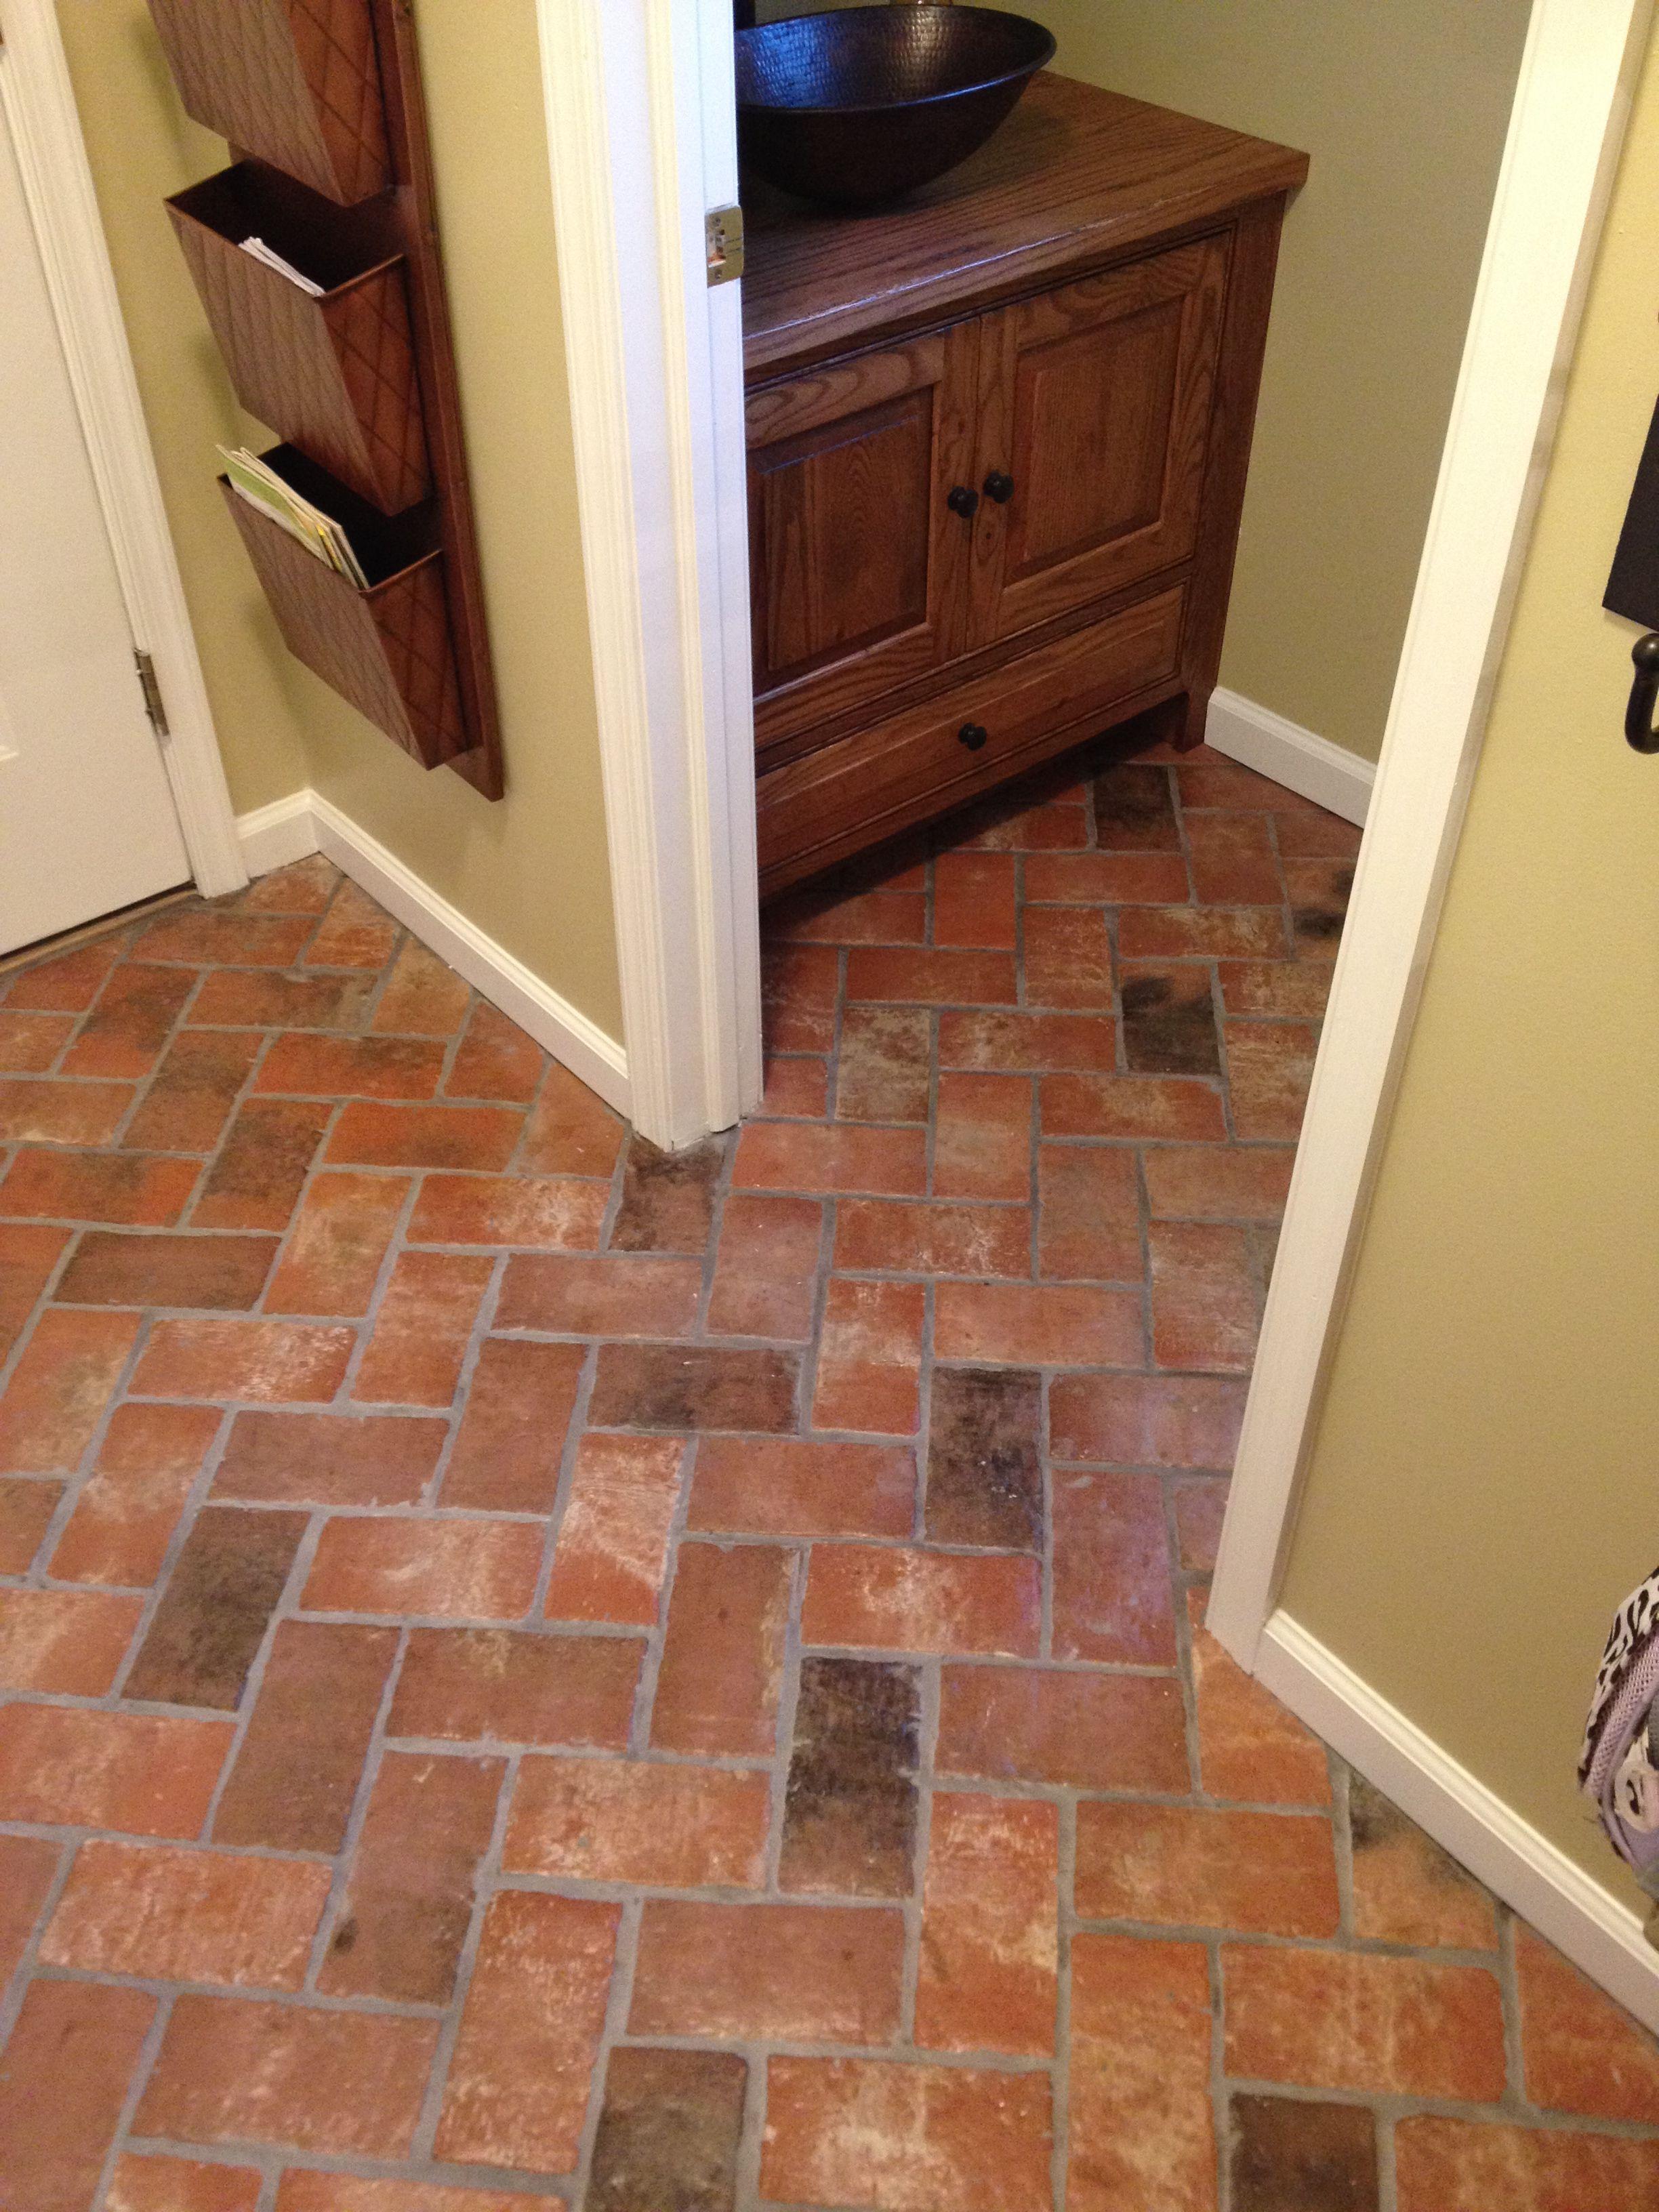 Wright S Ferry Brick Tile Entry Floor Marietta Color Mix With A Shiny Sealer Brick Flooring Brick Tile Floor Flooring